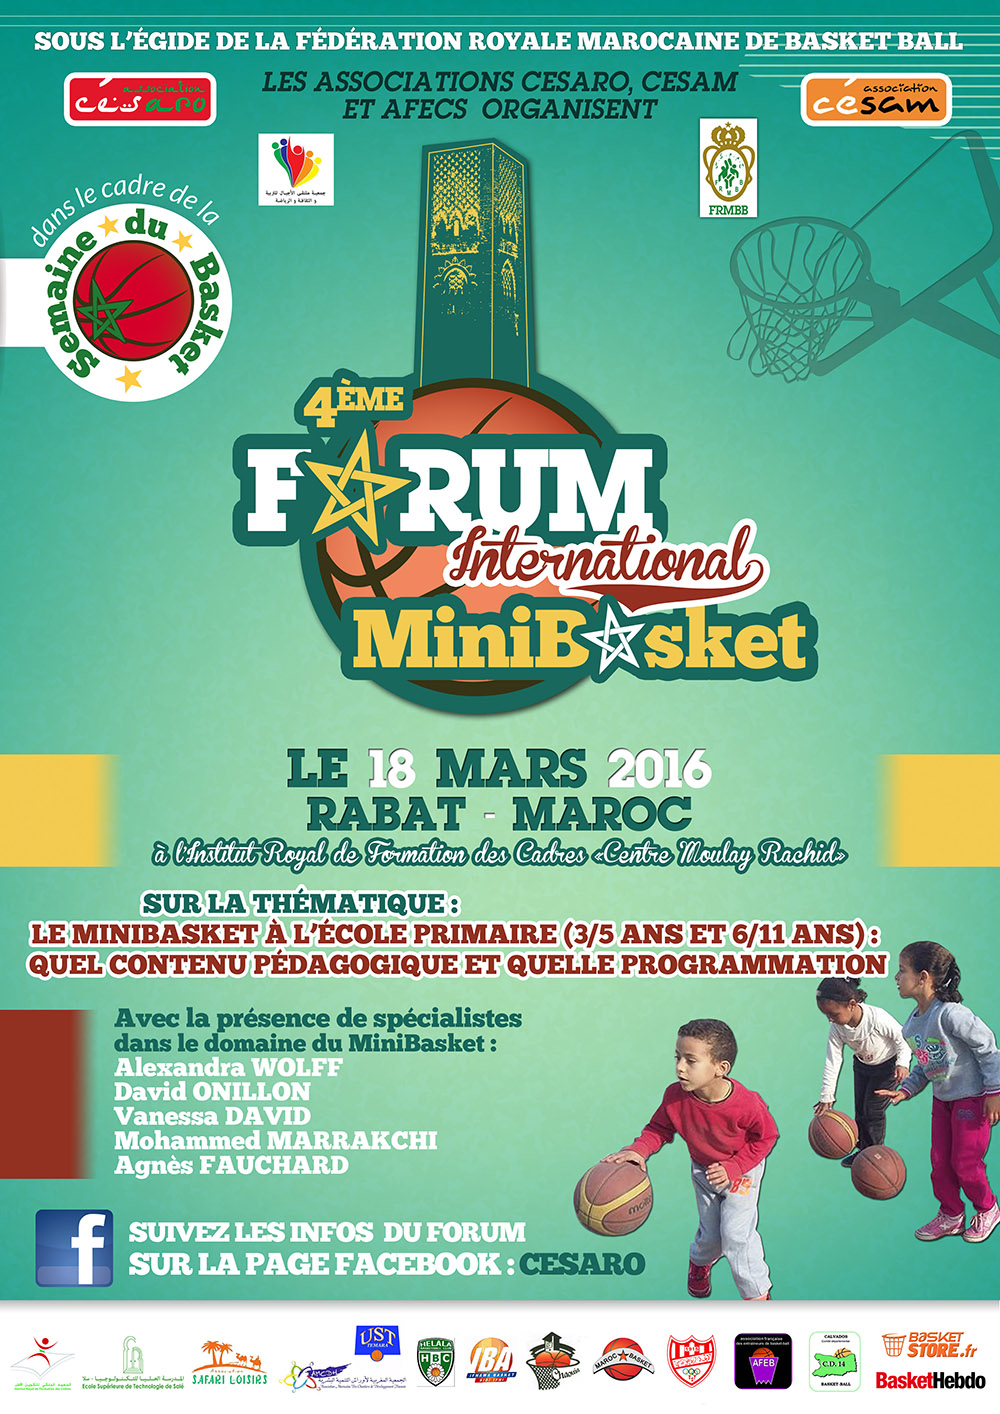 2-Affiche 4eÌme Forum Mini Basket – Vendredi